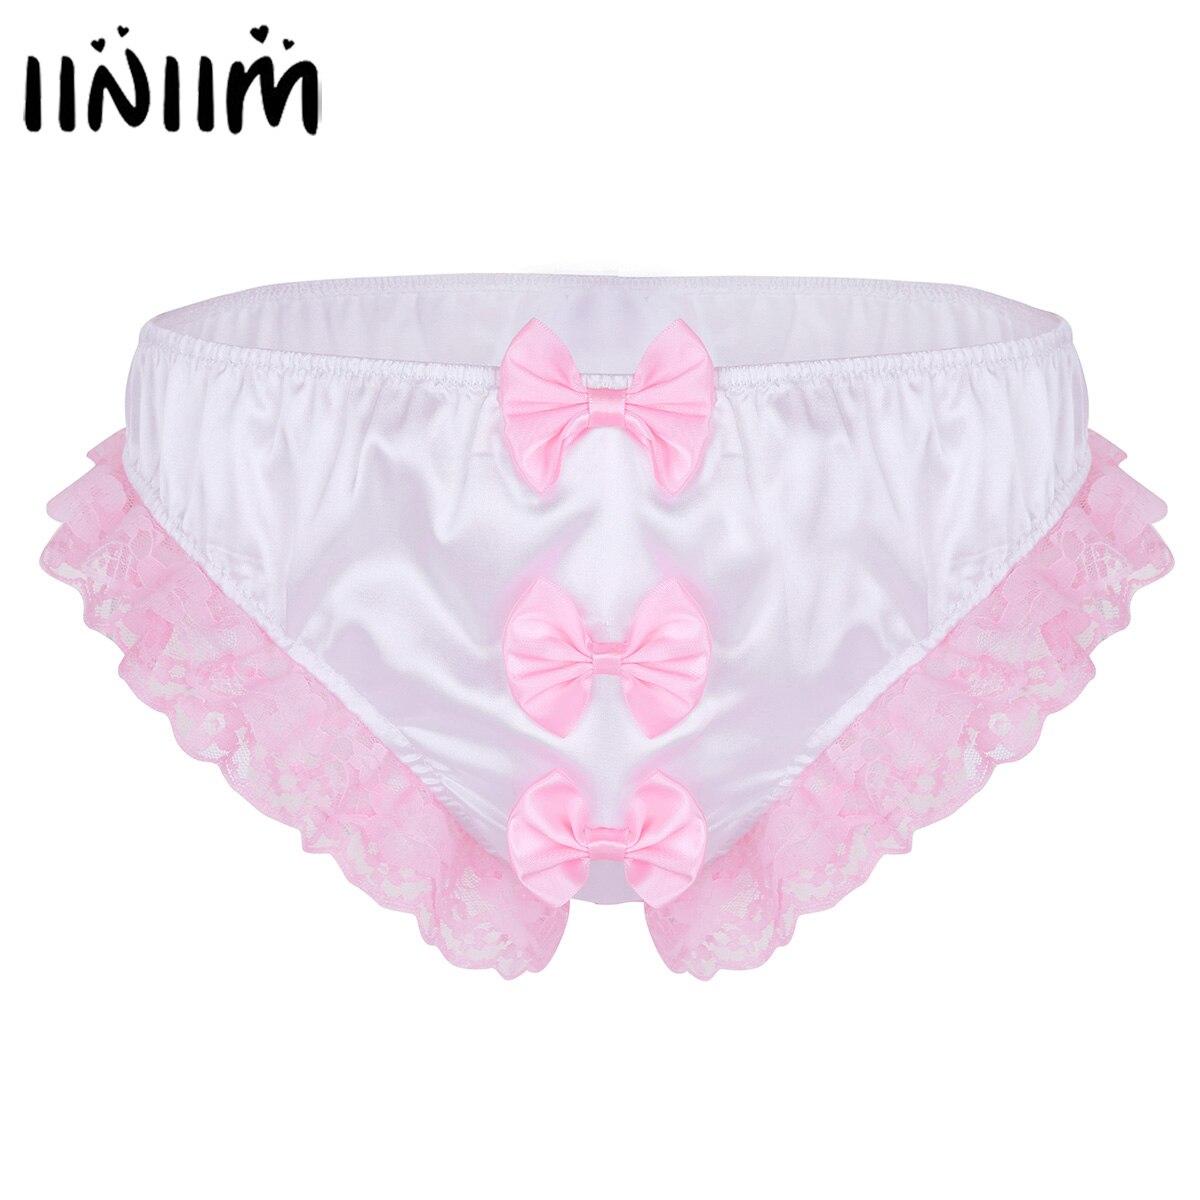 Iiniim Mens Lingerie Sissy Sexy Gay Panties Shiny Ruffles Floral Lace With Bowknots Jockstraps Briefs Underwear Underpants